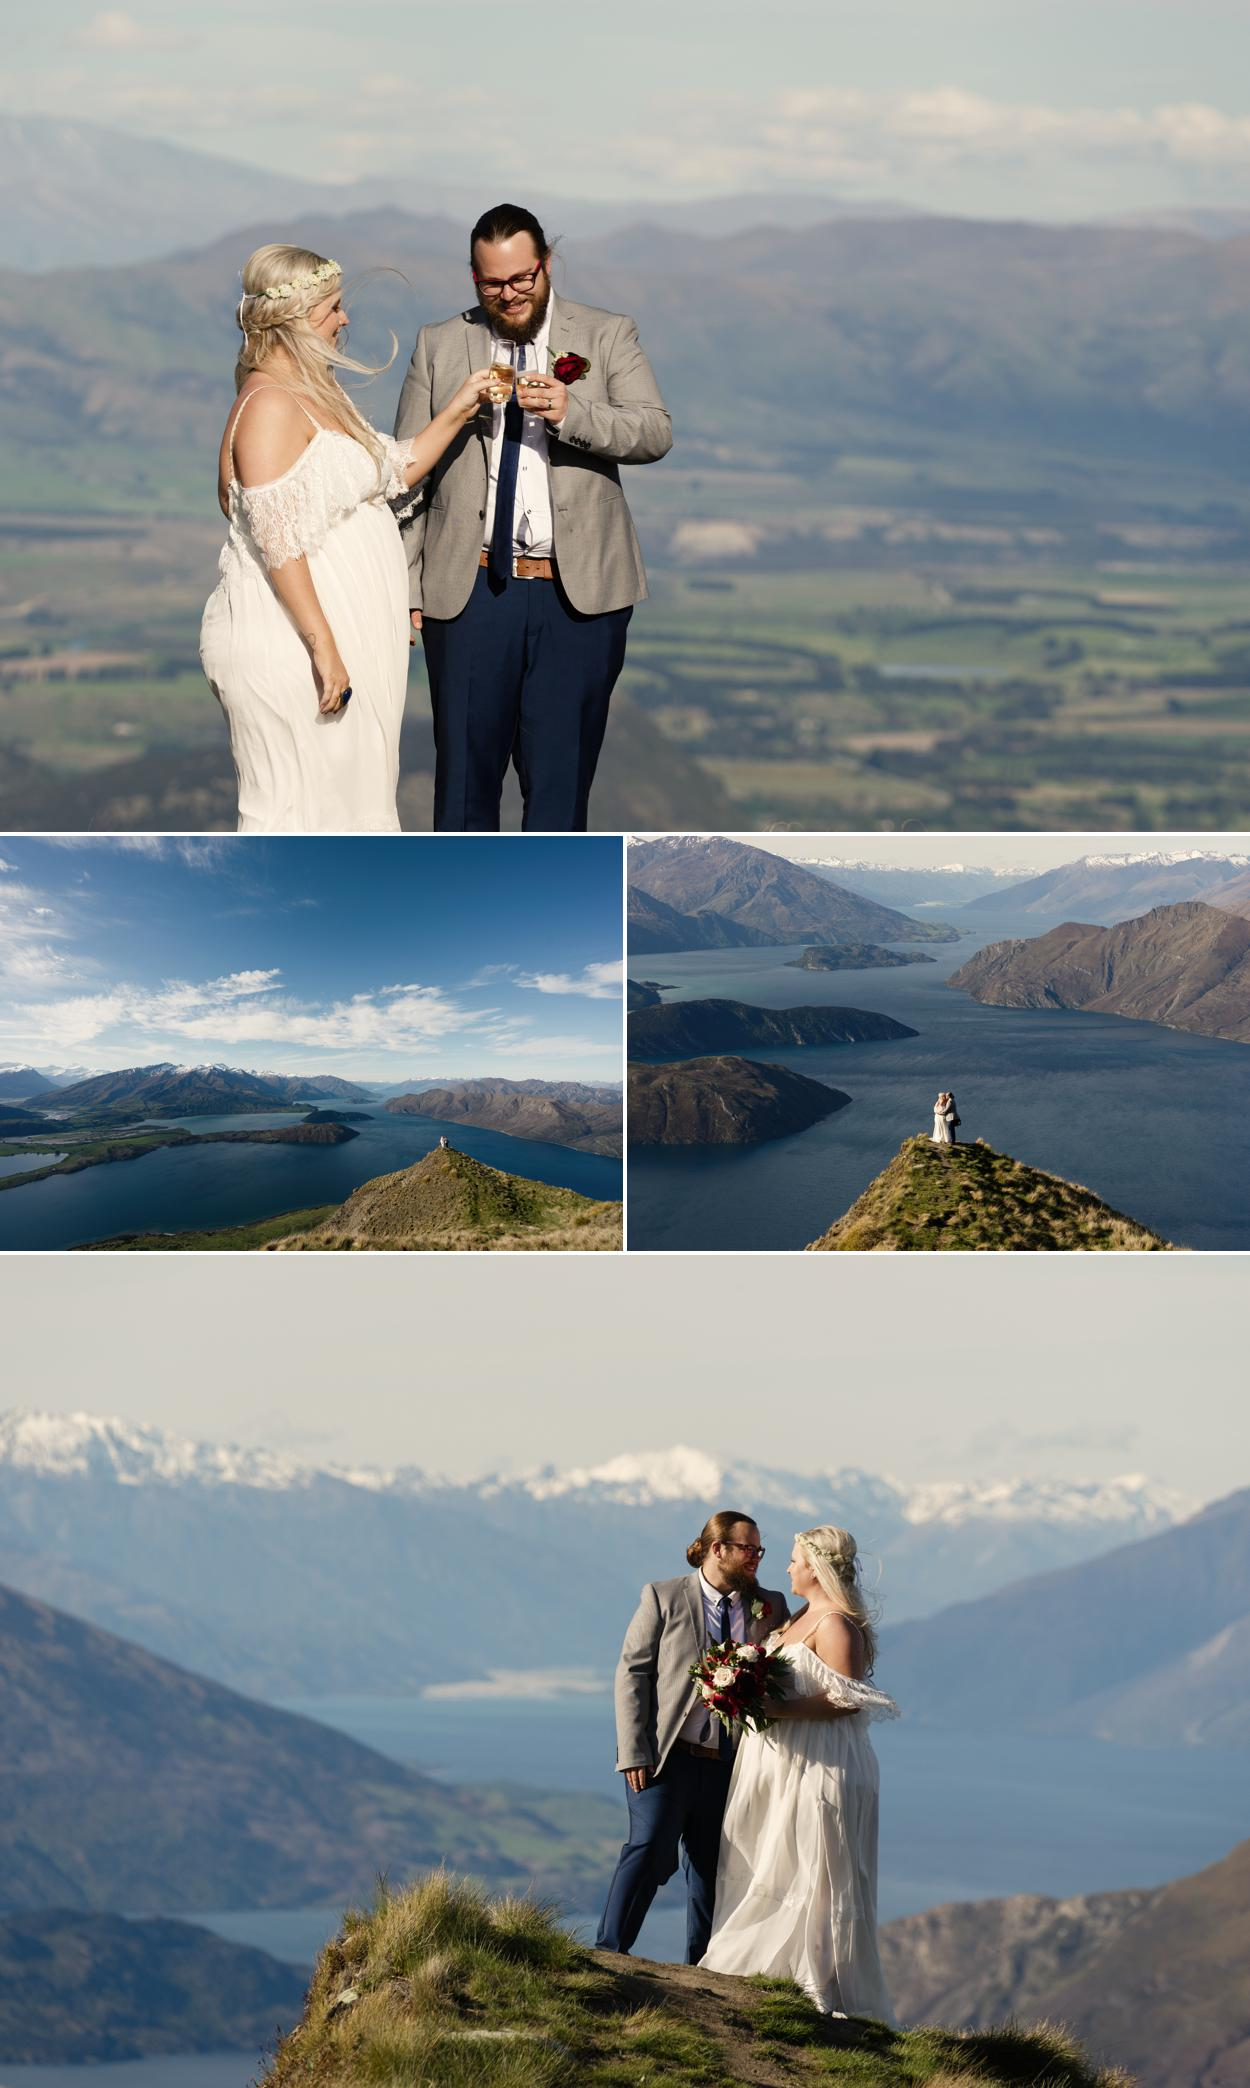 Coromandel Peak wedding photographer